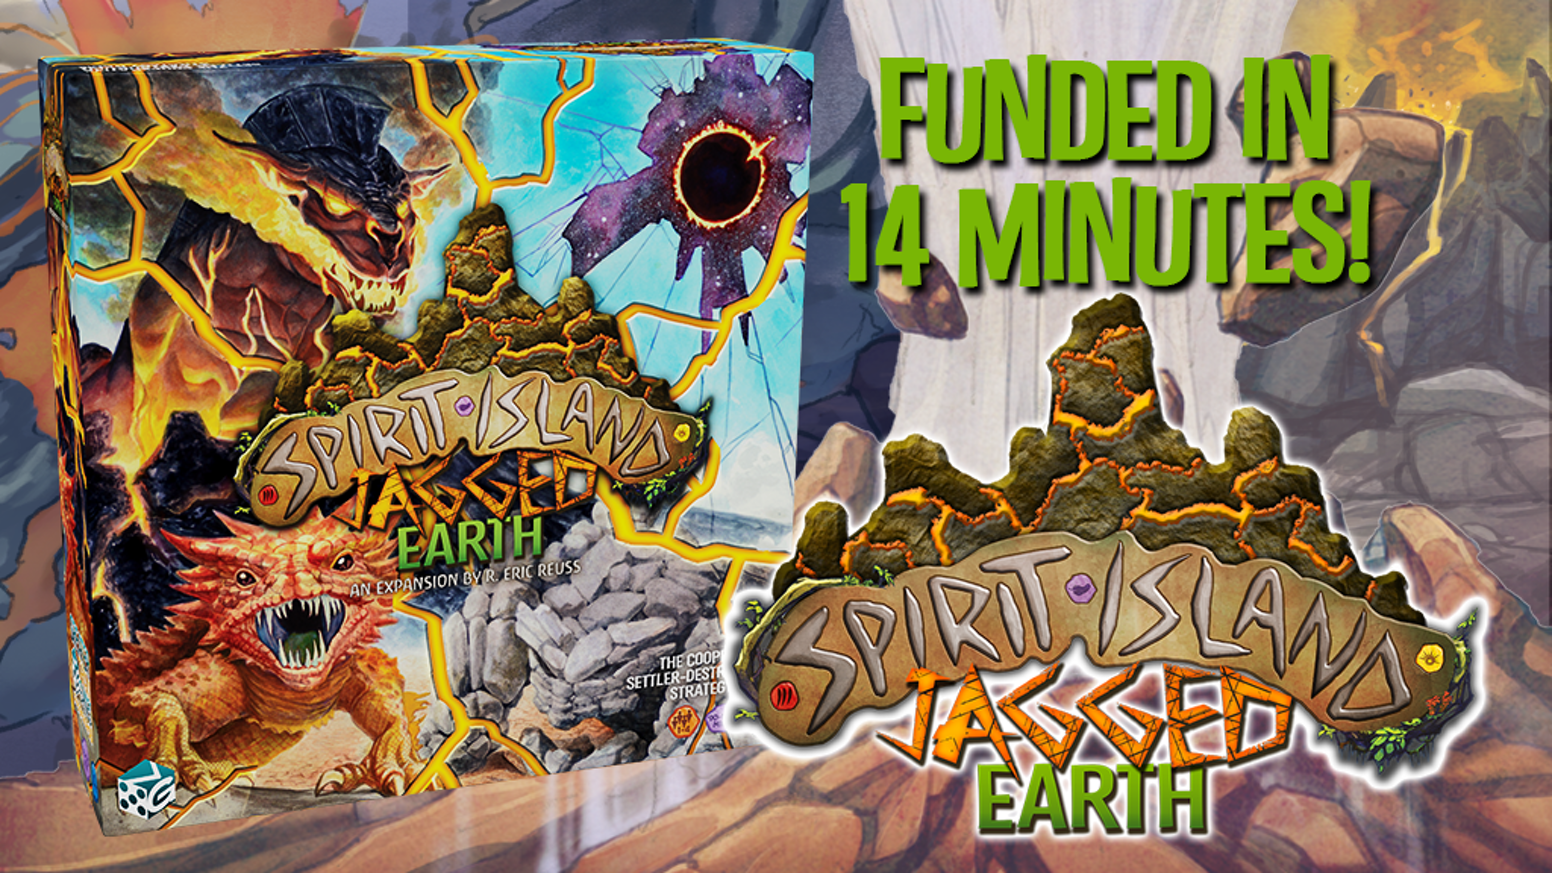 Spirit Island: Jagged Earth by GreaterThanGames — Kickstarter